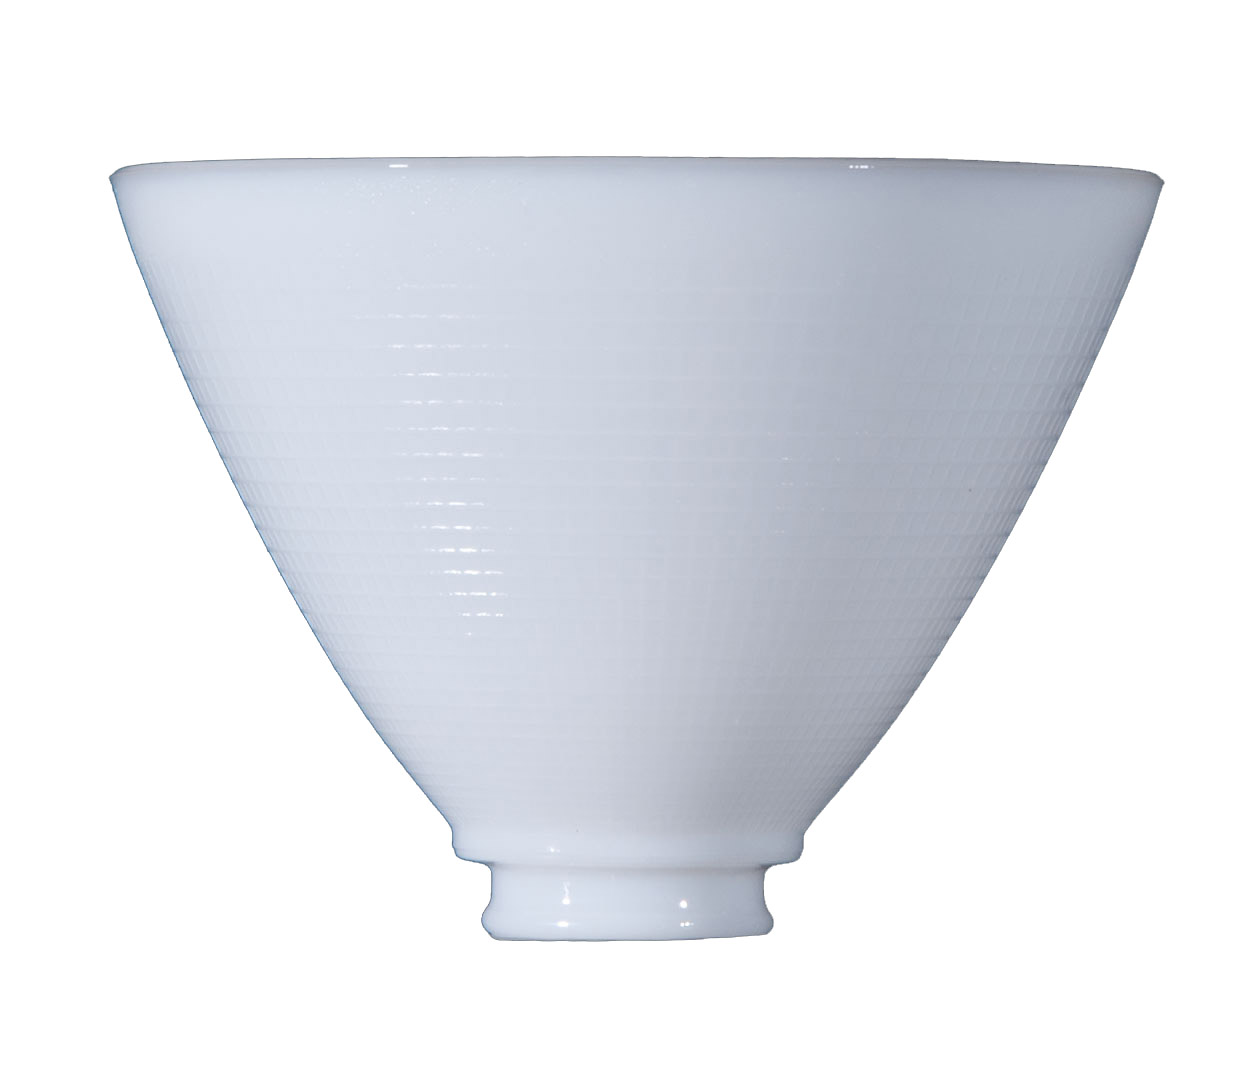 8 ies opal glass reflector shade 08391 bp lamp supply for 8 inch glass floor lamp reflector shade glass